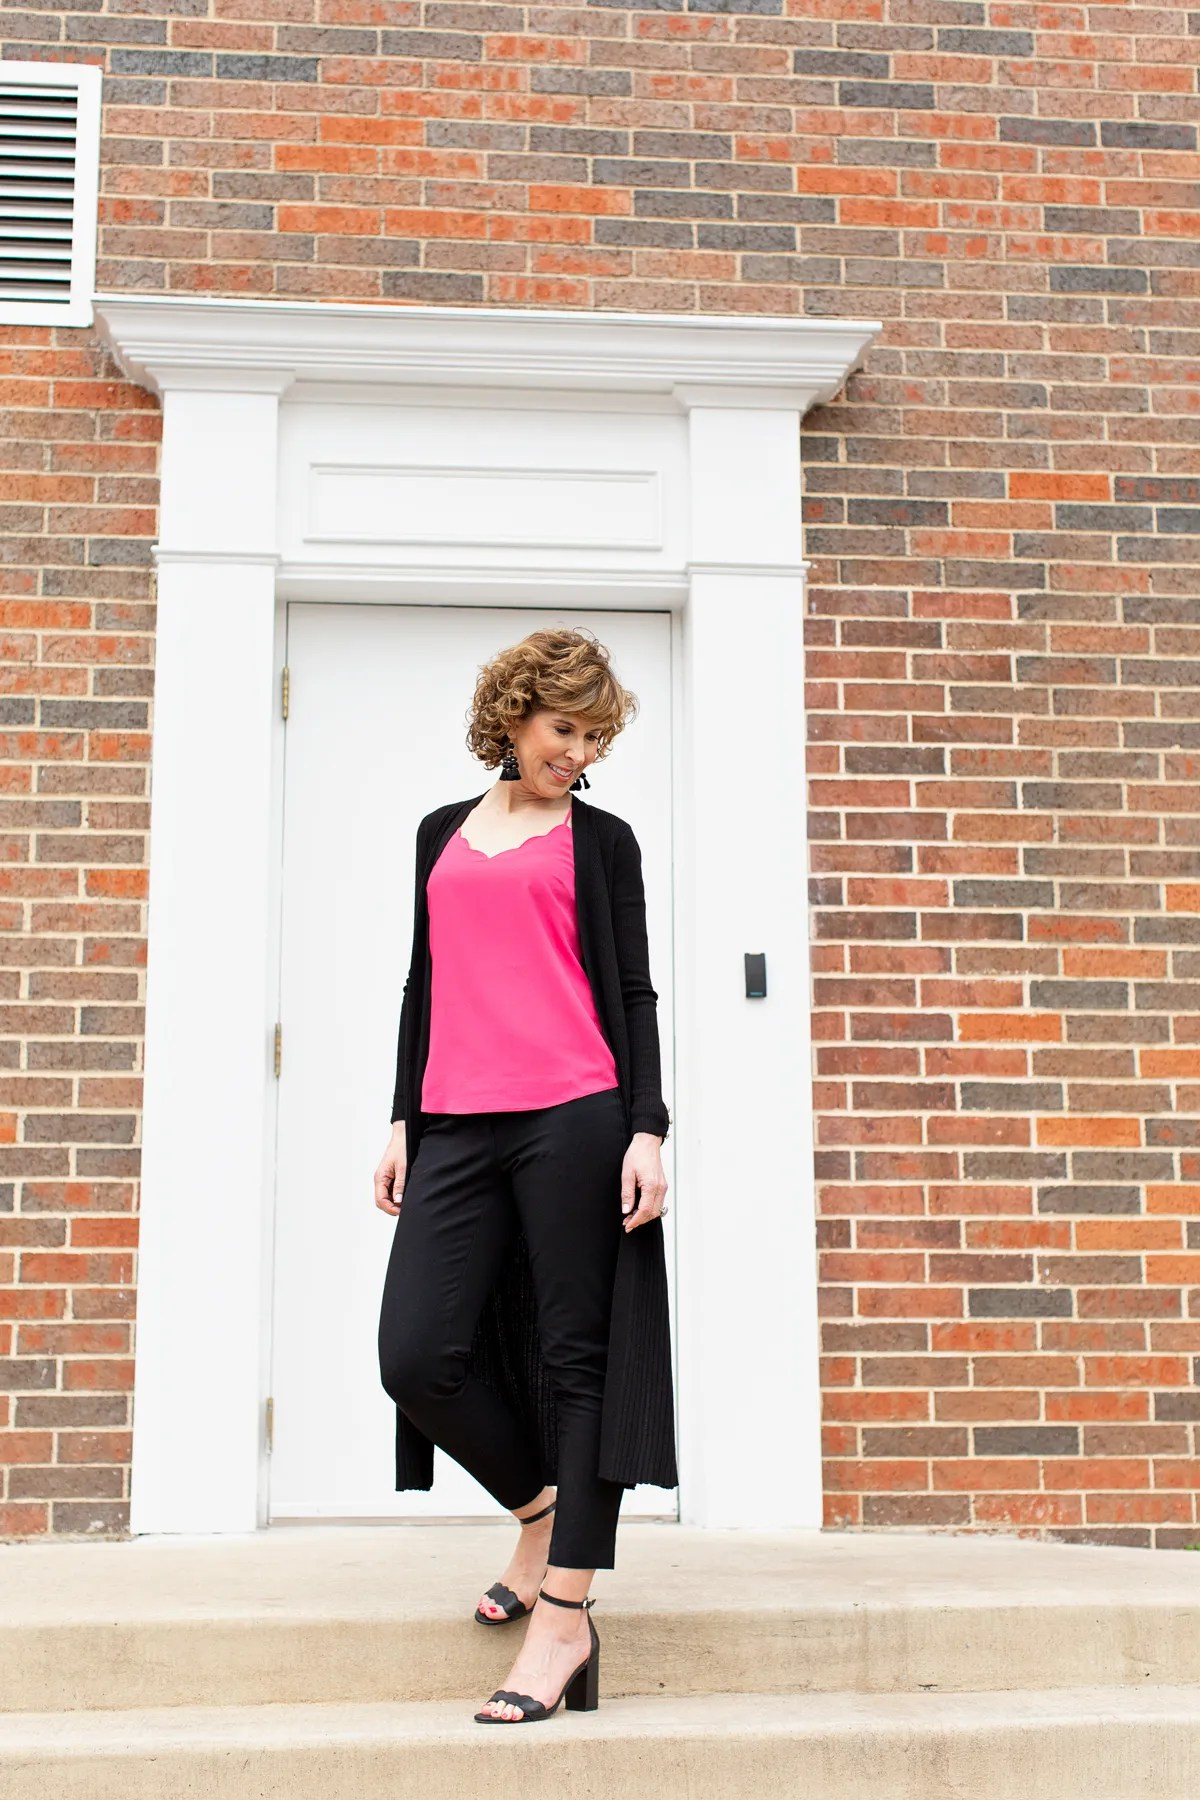 woman standing in front of doorway in pink top with black sweater